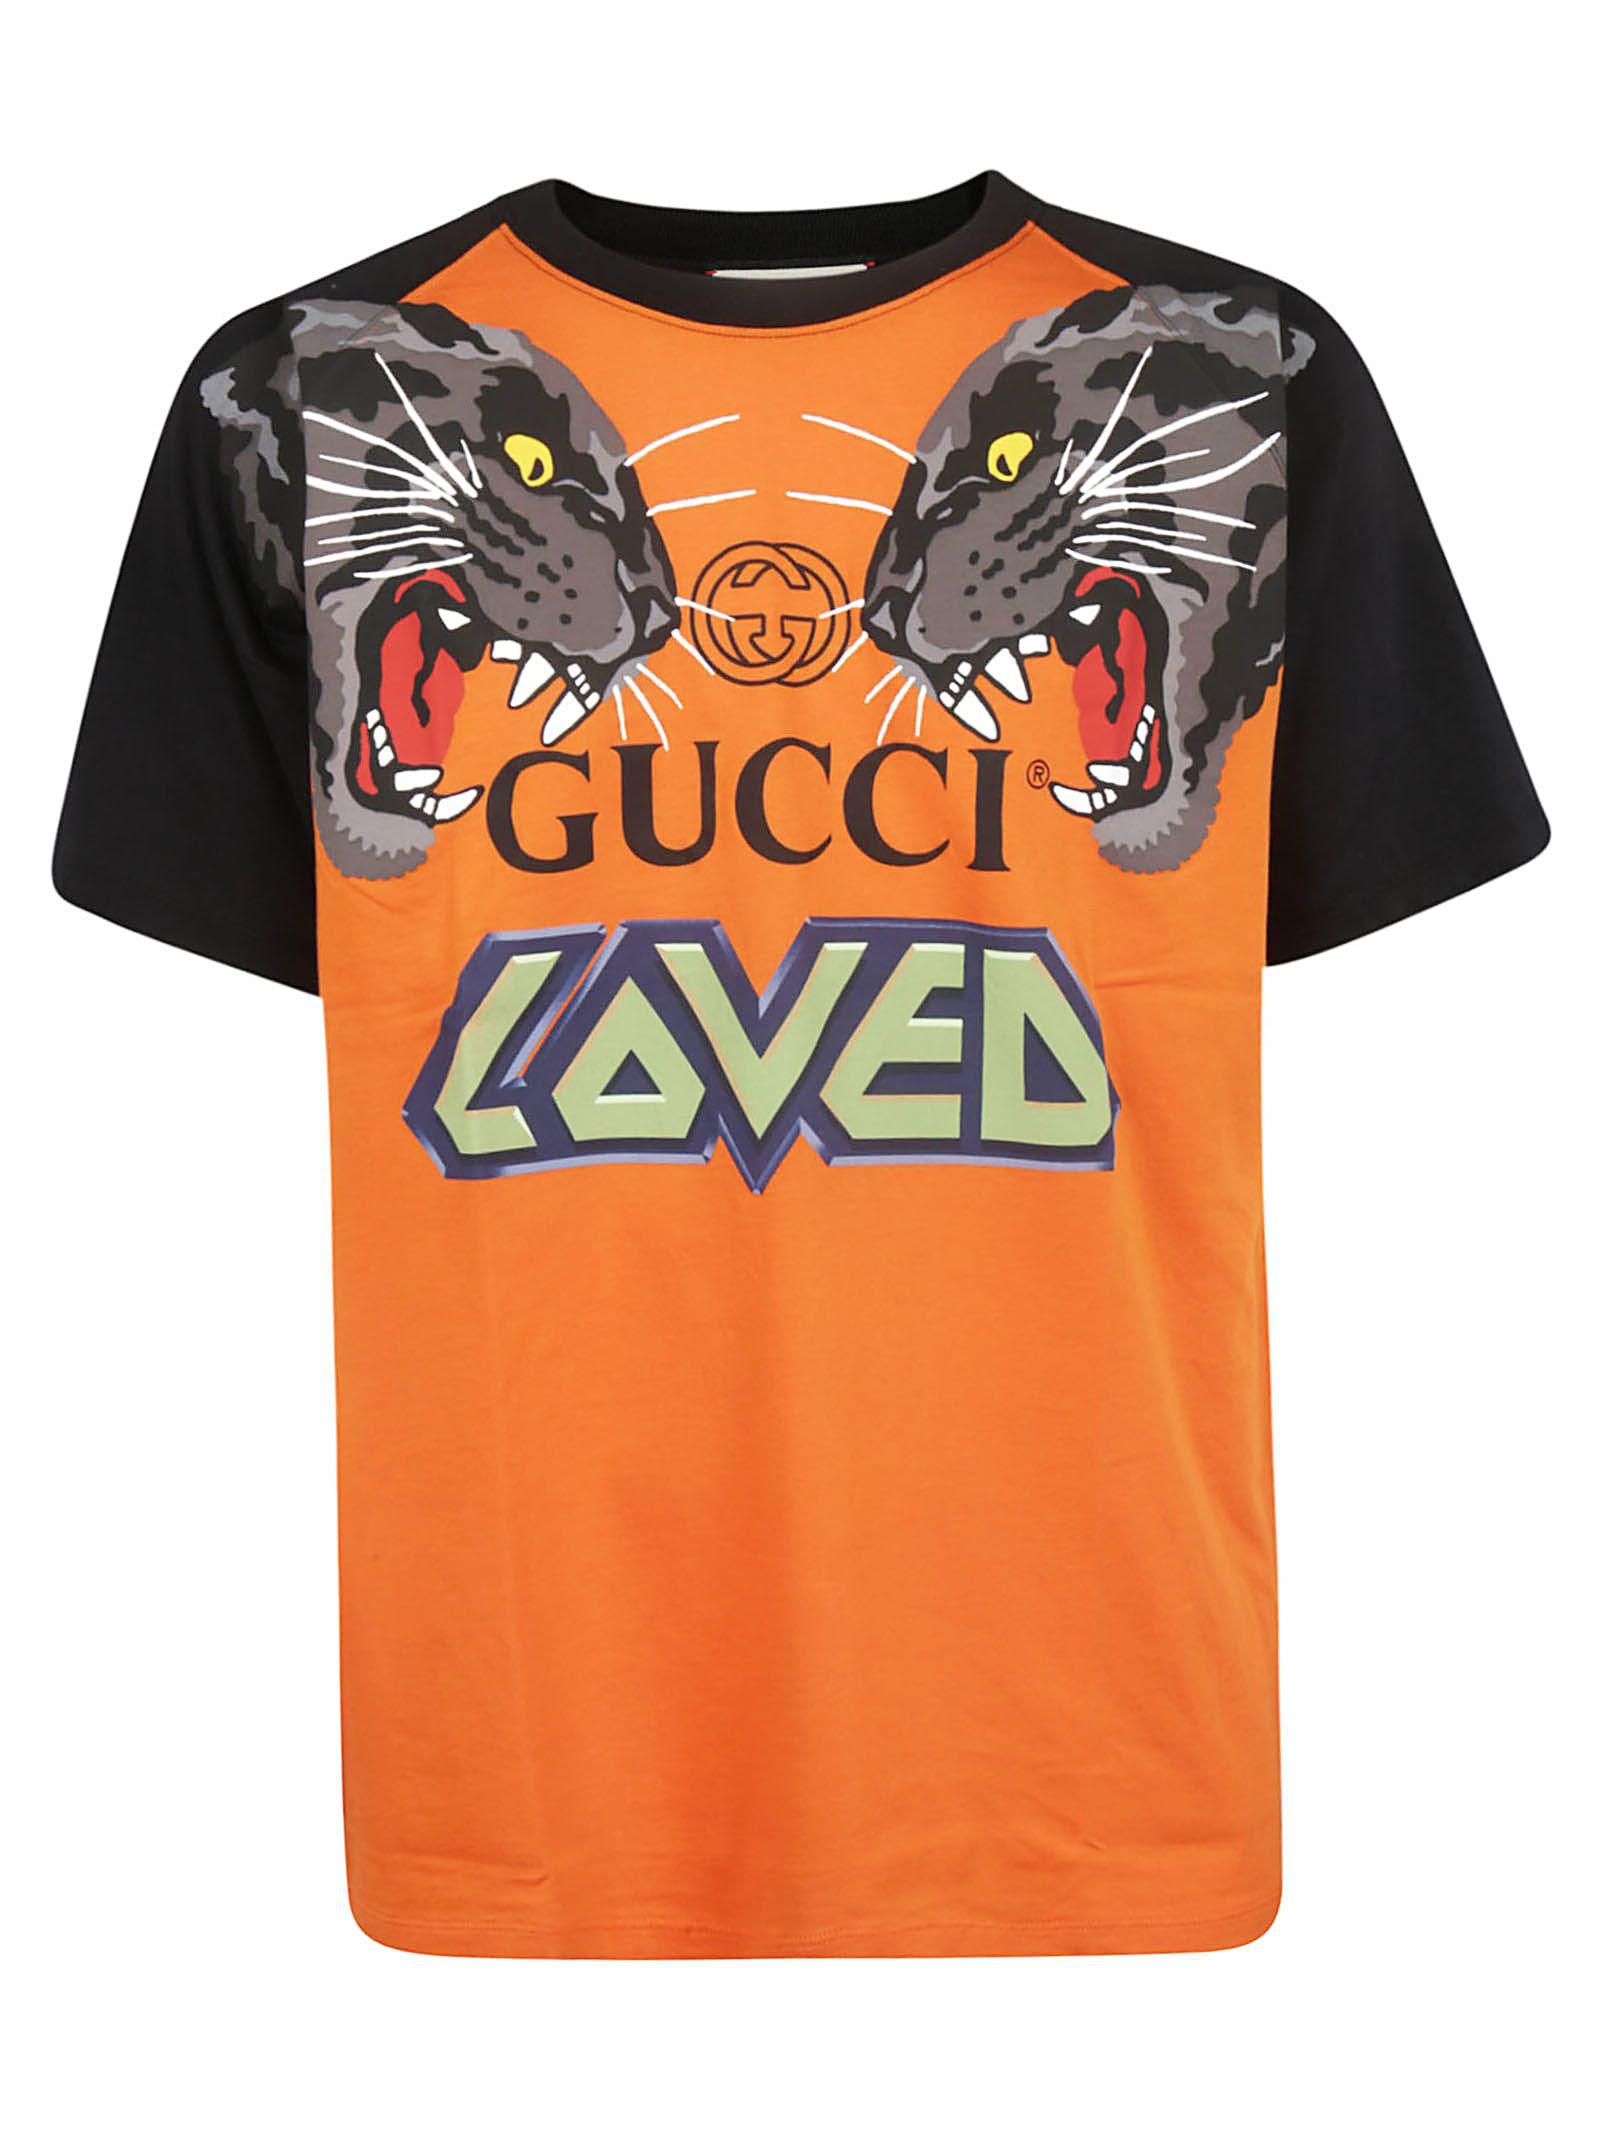 5b51f7f5521 Gucci Men s Tiger Graphic T-Shirt